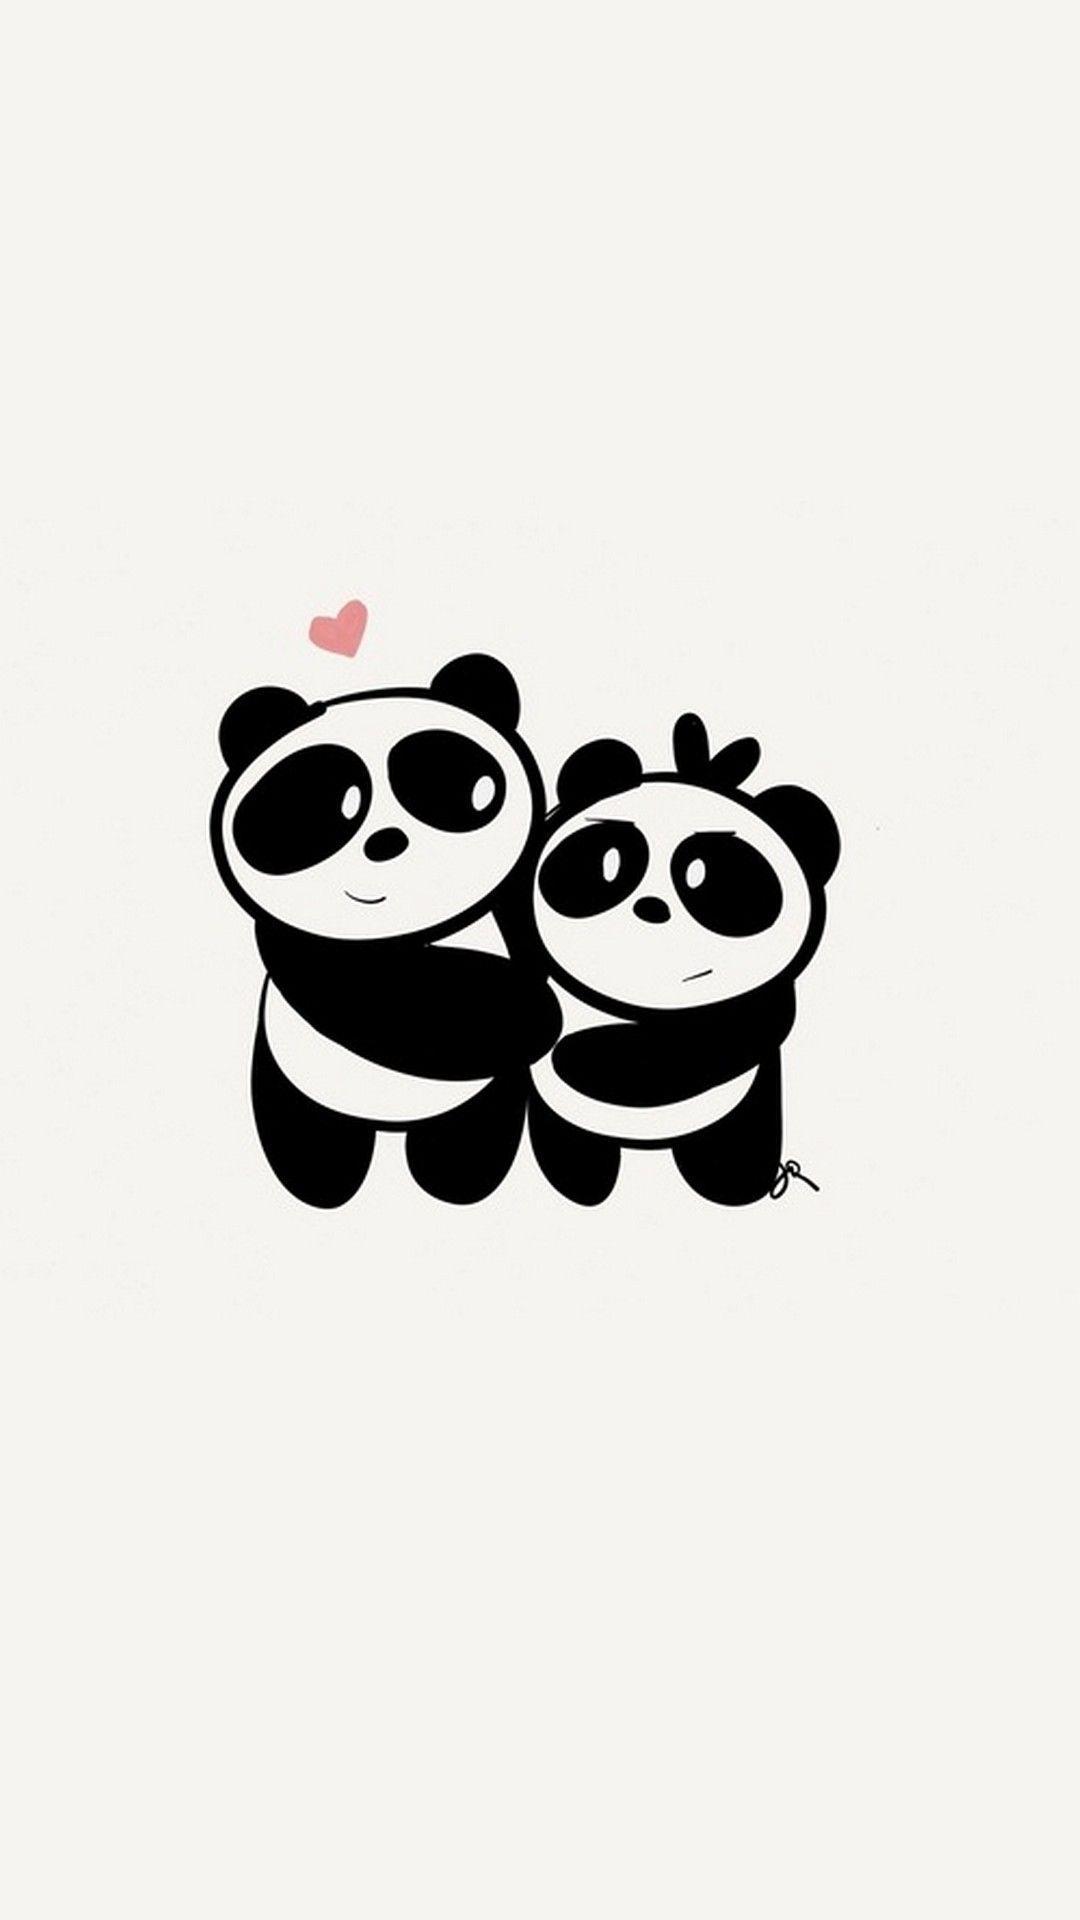 Cute Panda Wallpapers Top Free Cute Panda Backgrounds